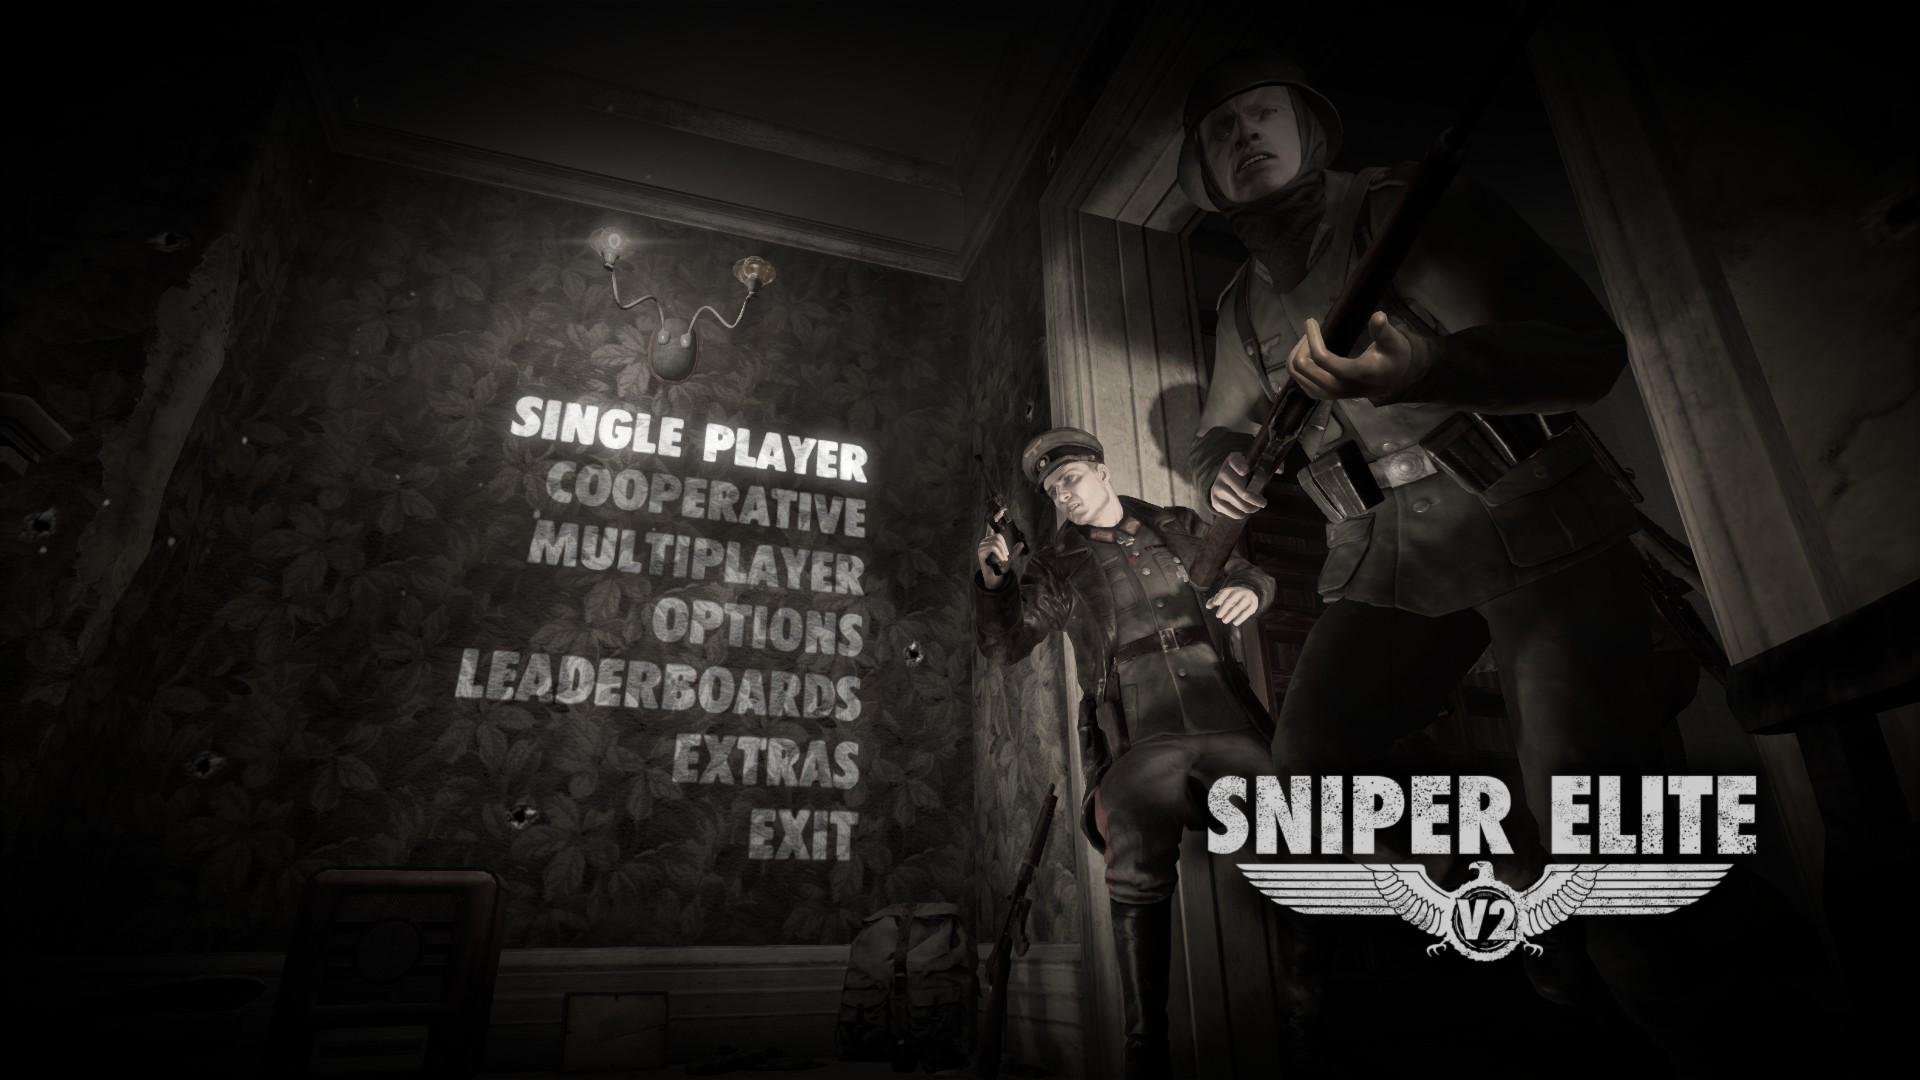 Artistry in Games 2014-06-10_00020 Still Alive! Sniper Elite V2 (PC) Series  v2 sniping sniper respawn Online multiplayer multi-player headshot games game Cooperative Co-op Artistry afrika